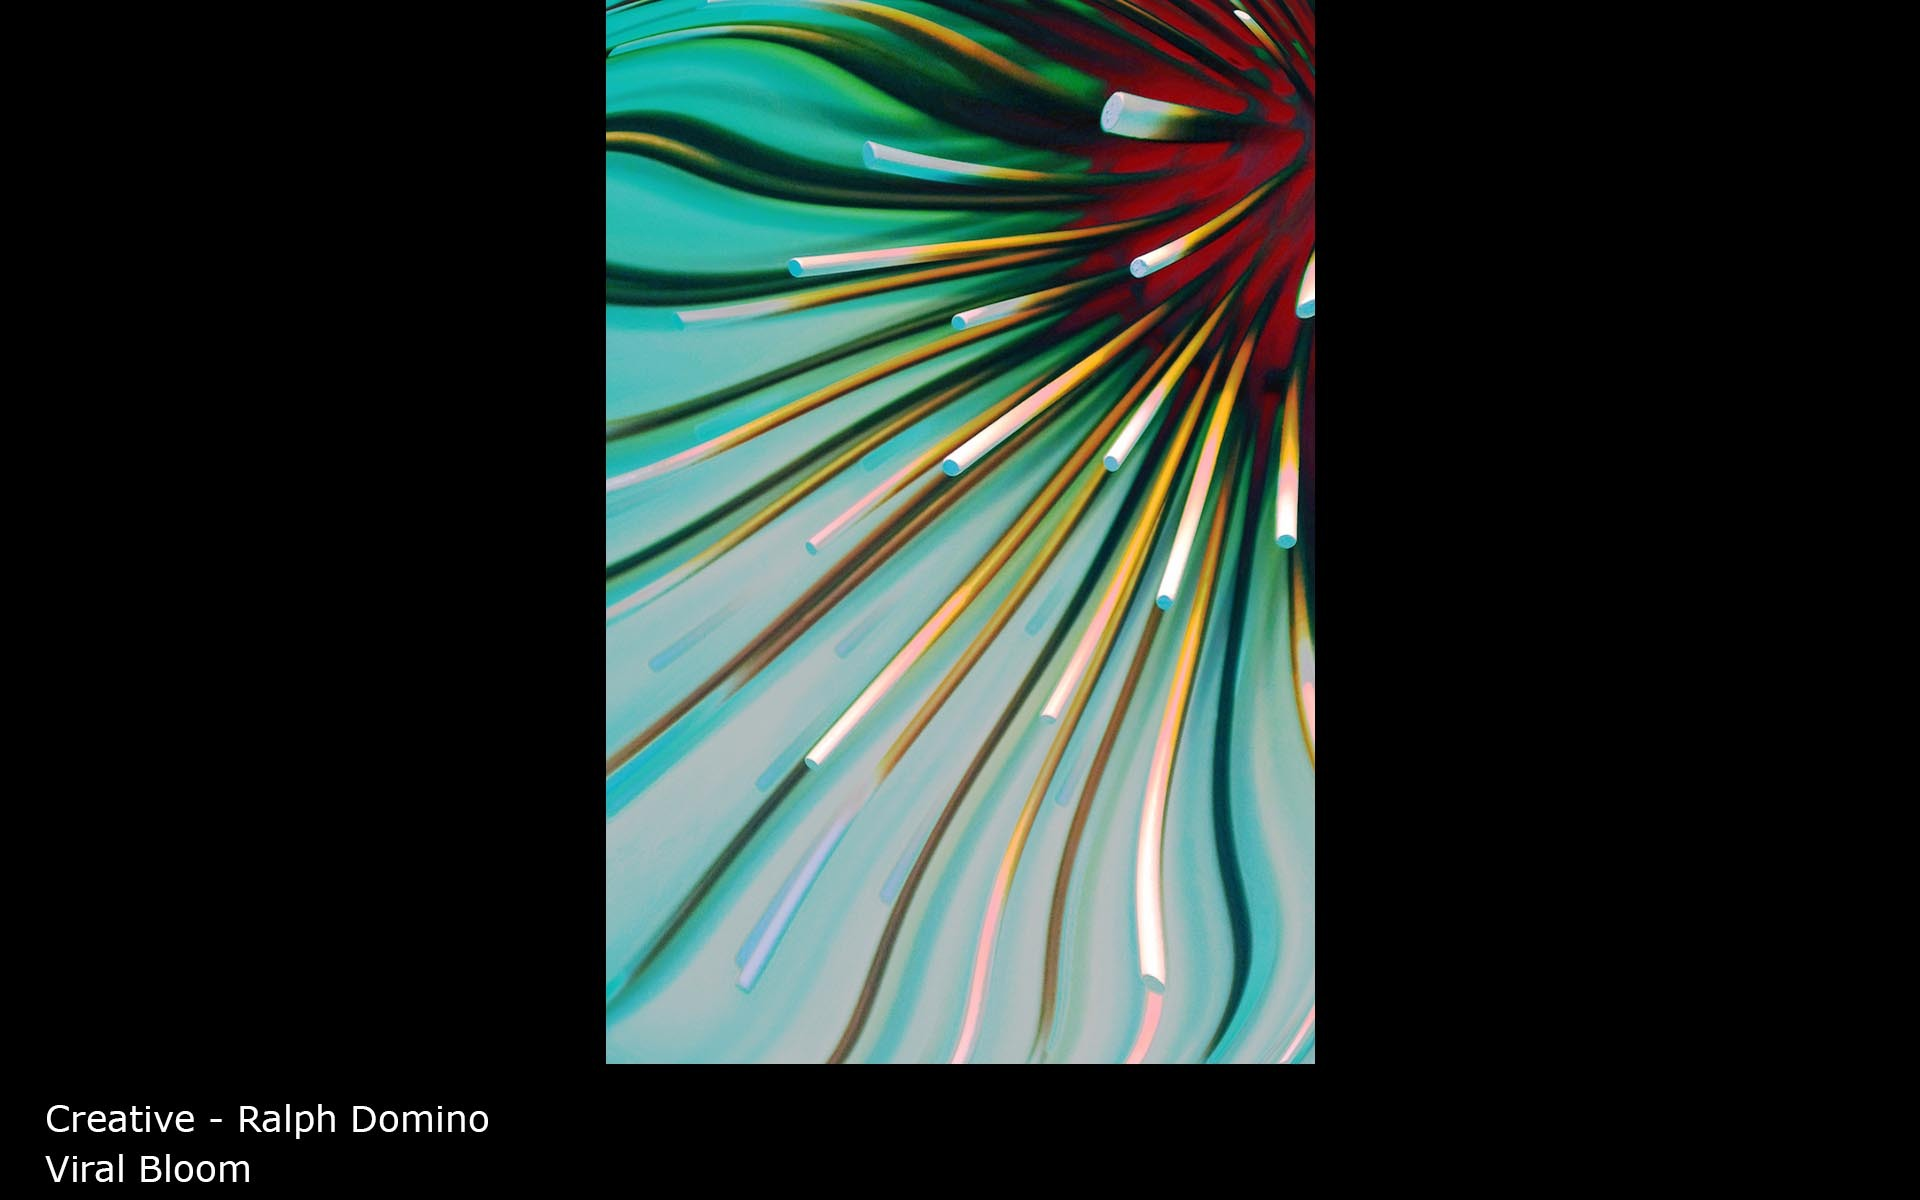 Viral Bloom - Ralph Domino